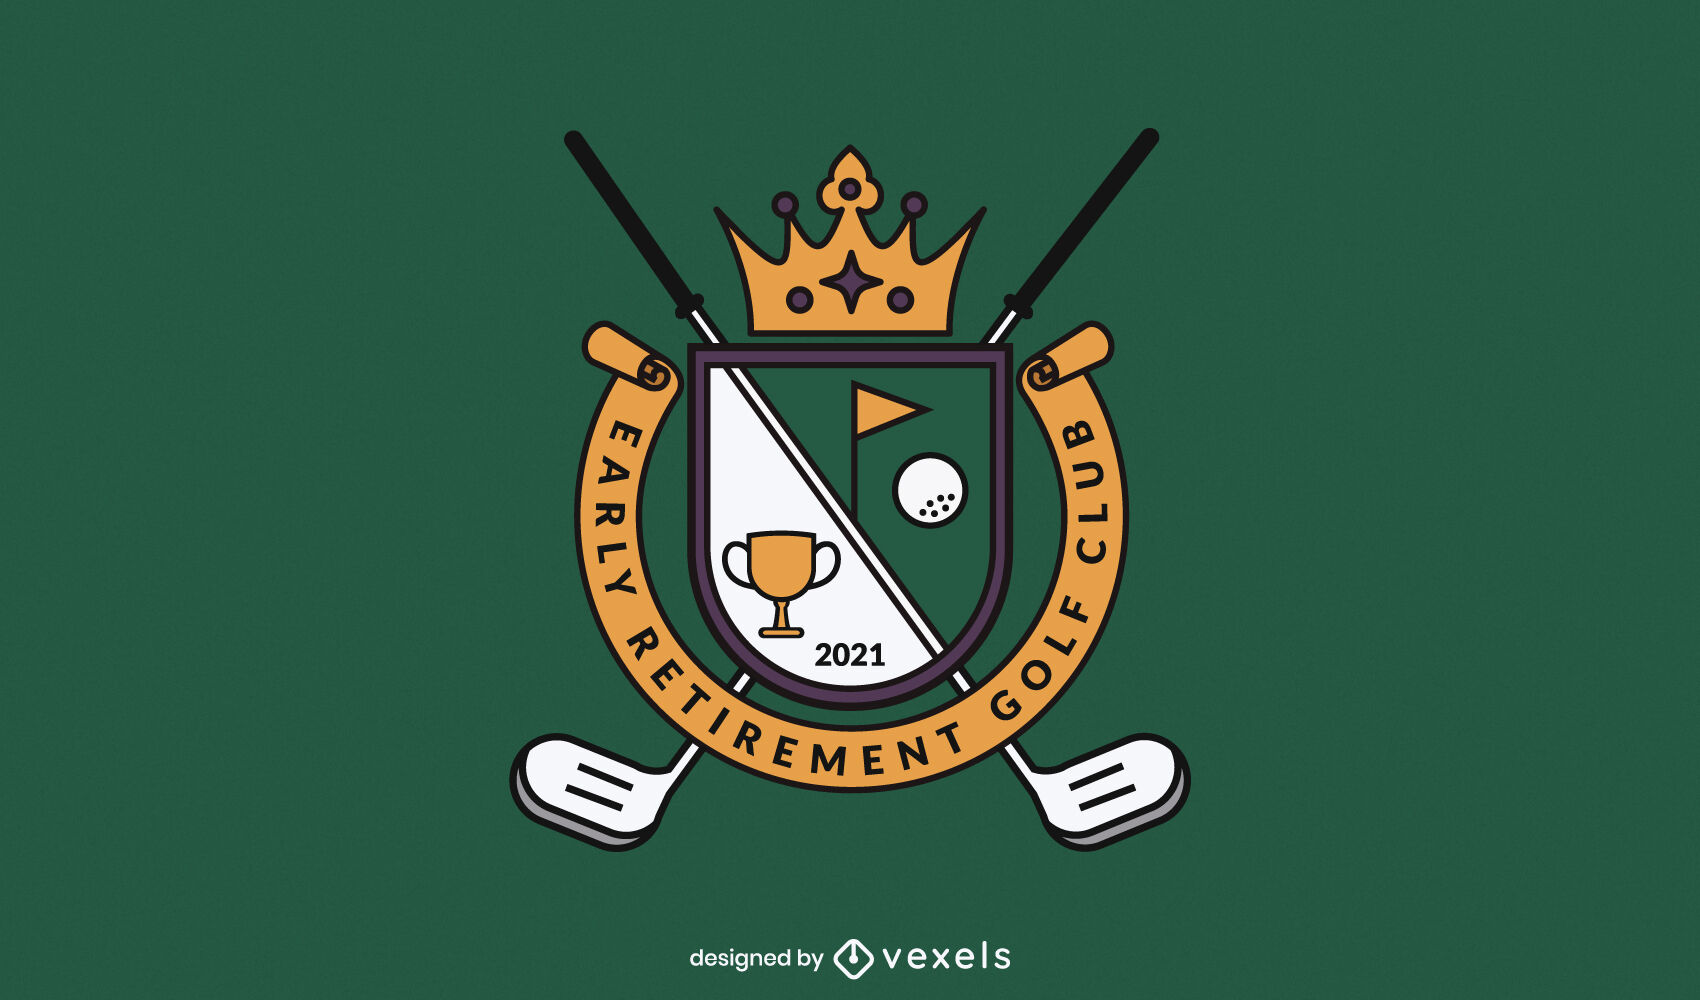 Dise?o de logotipo de empresa de equipamiento deportivo de golf.